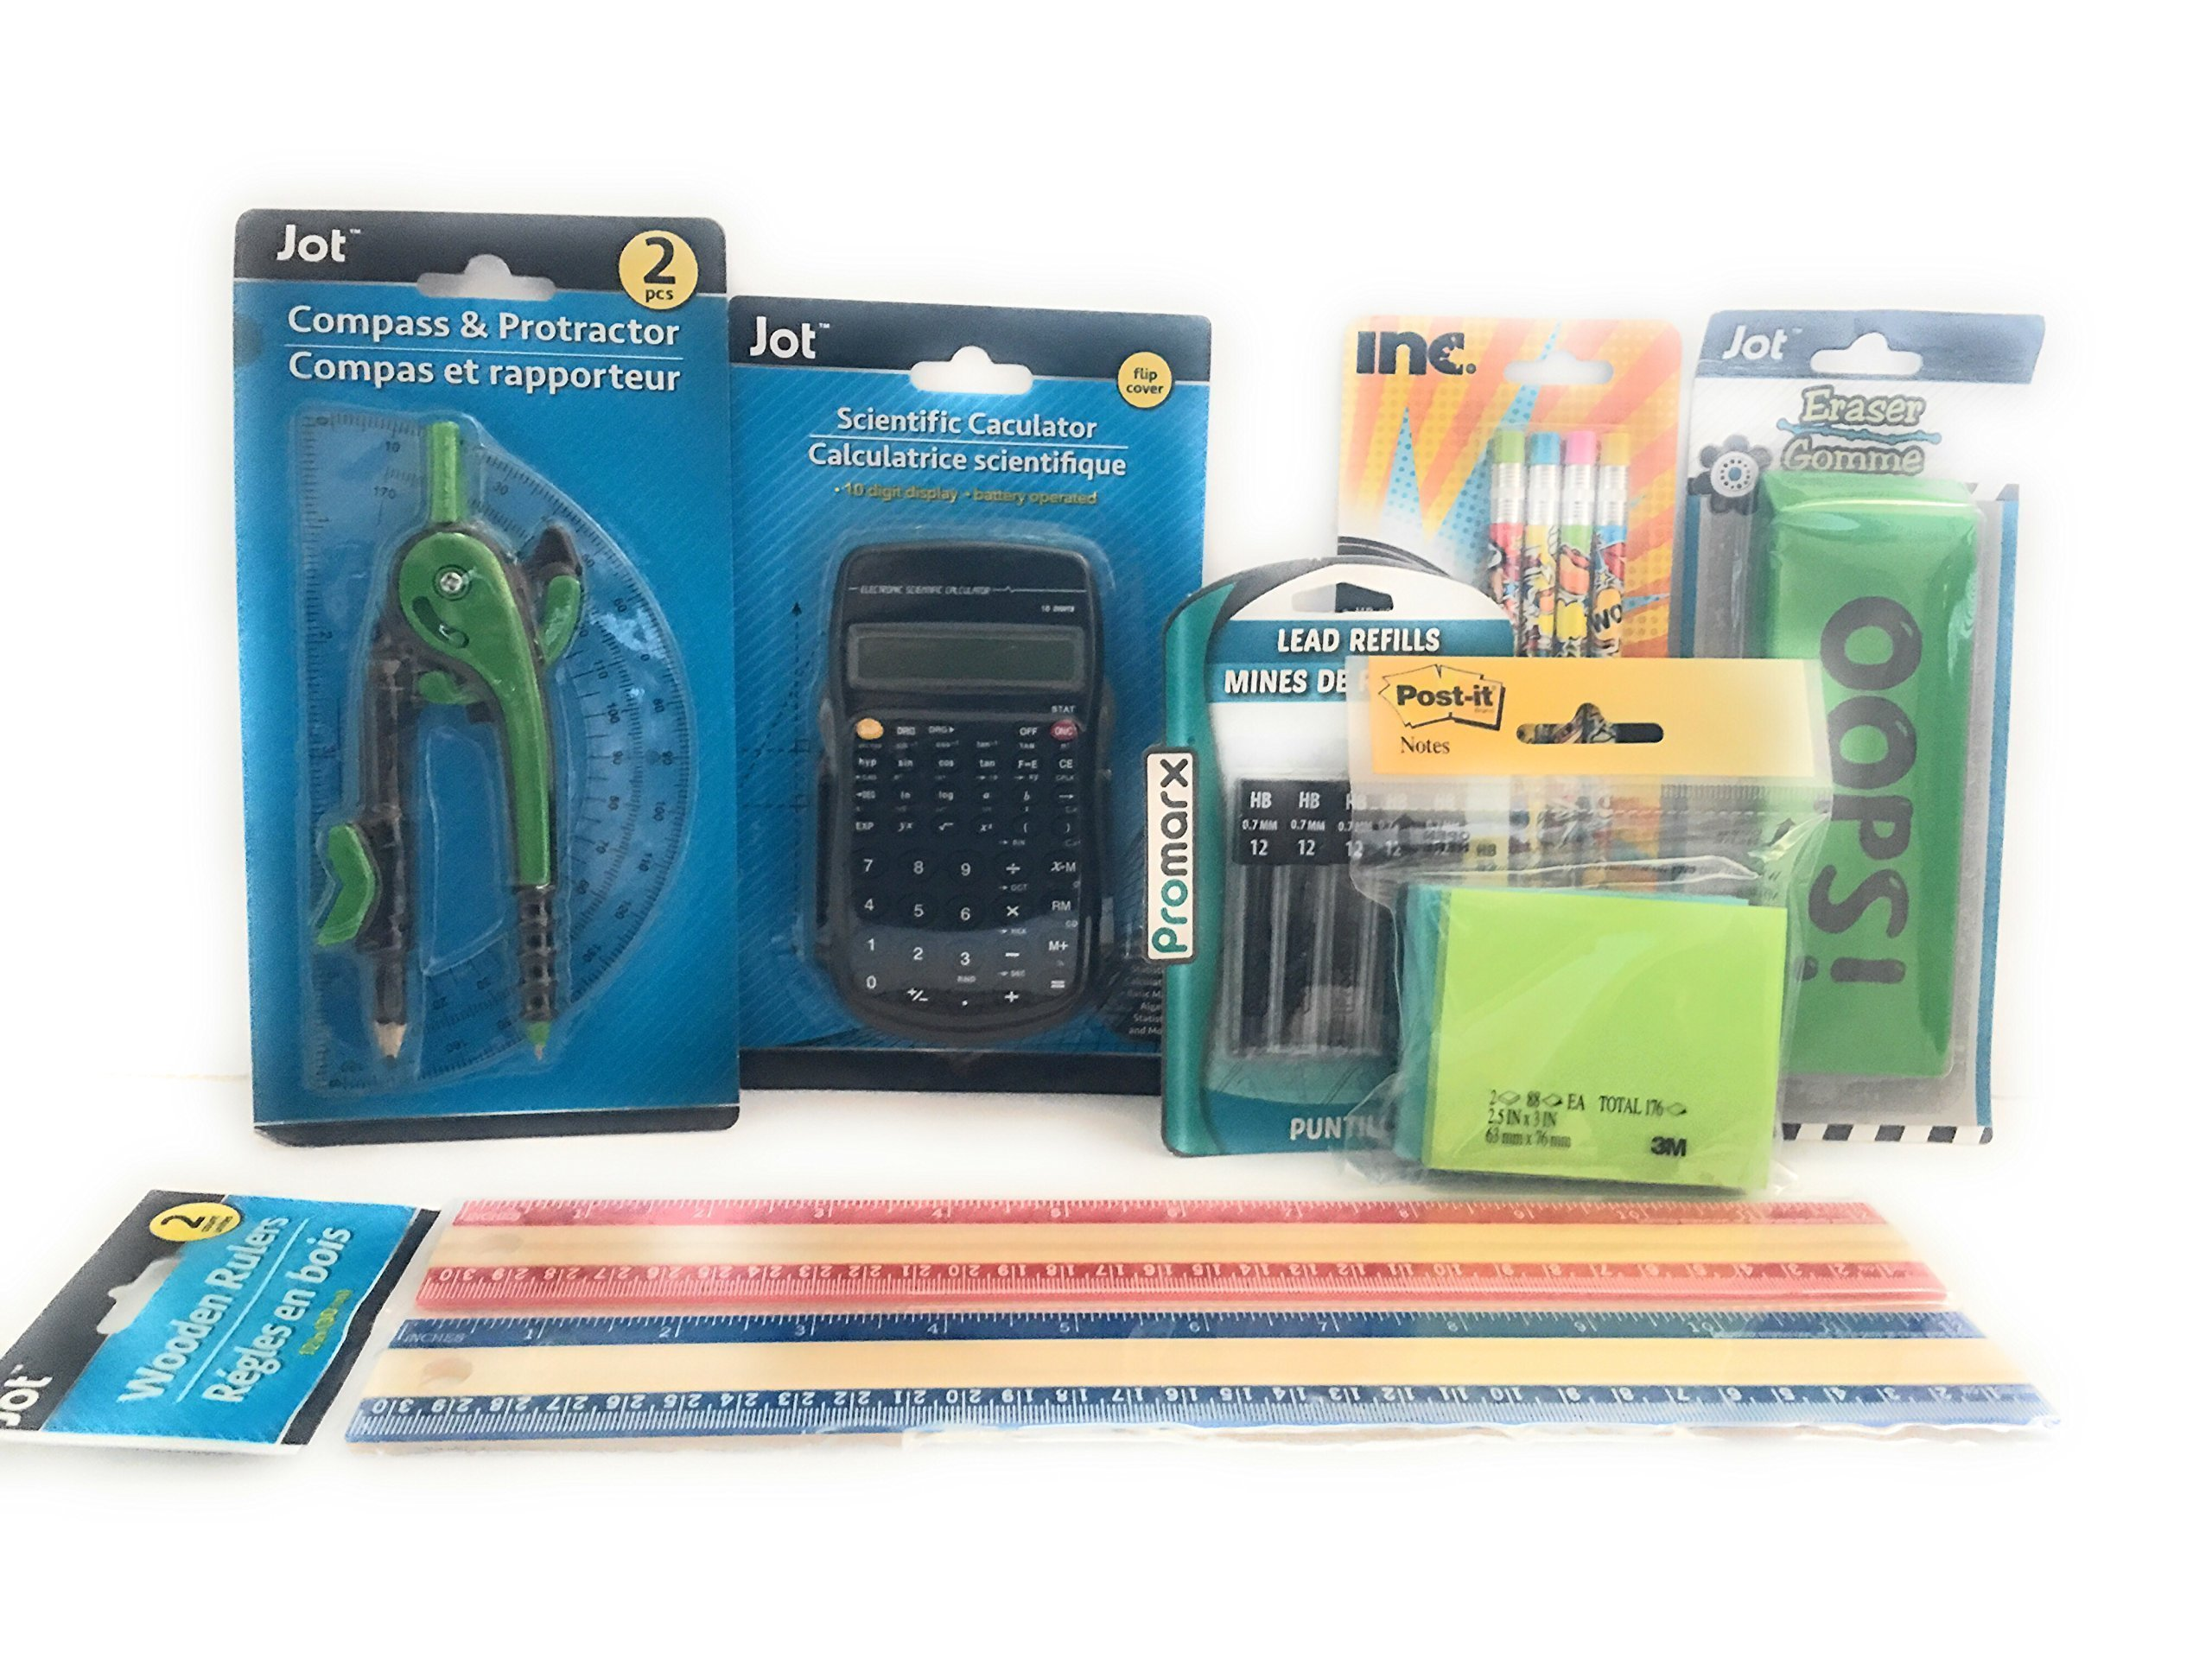 Grade School Math Arithmetic Tool Set - 7 Pieces Compass & Protractor, Eraser, Lead Refills, Mechanical Pencils, Post-it, Scientific Calculator and Wooden Rulers